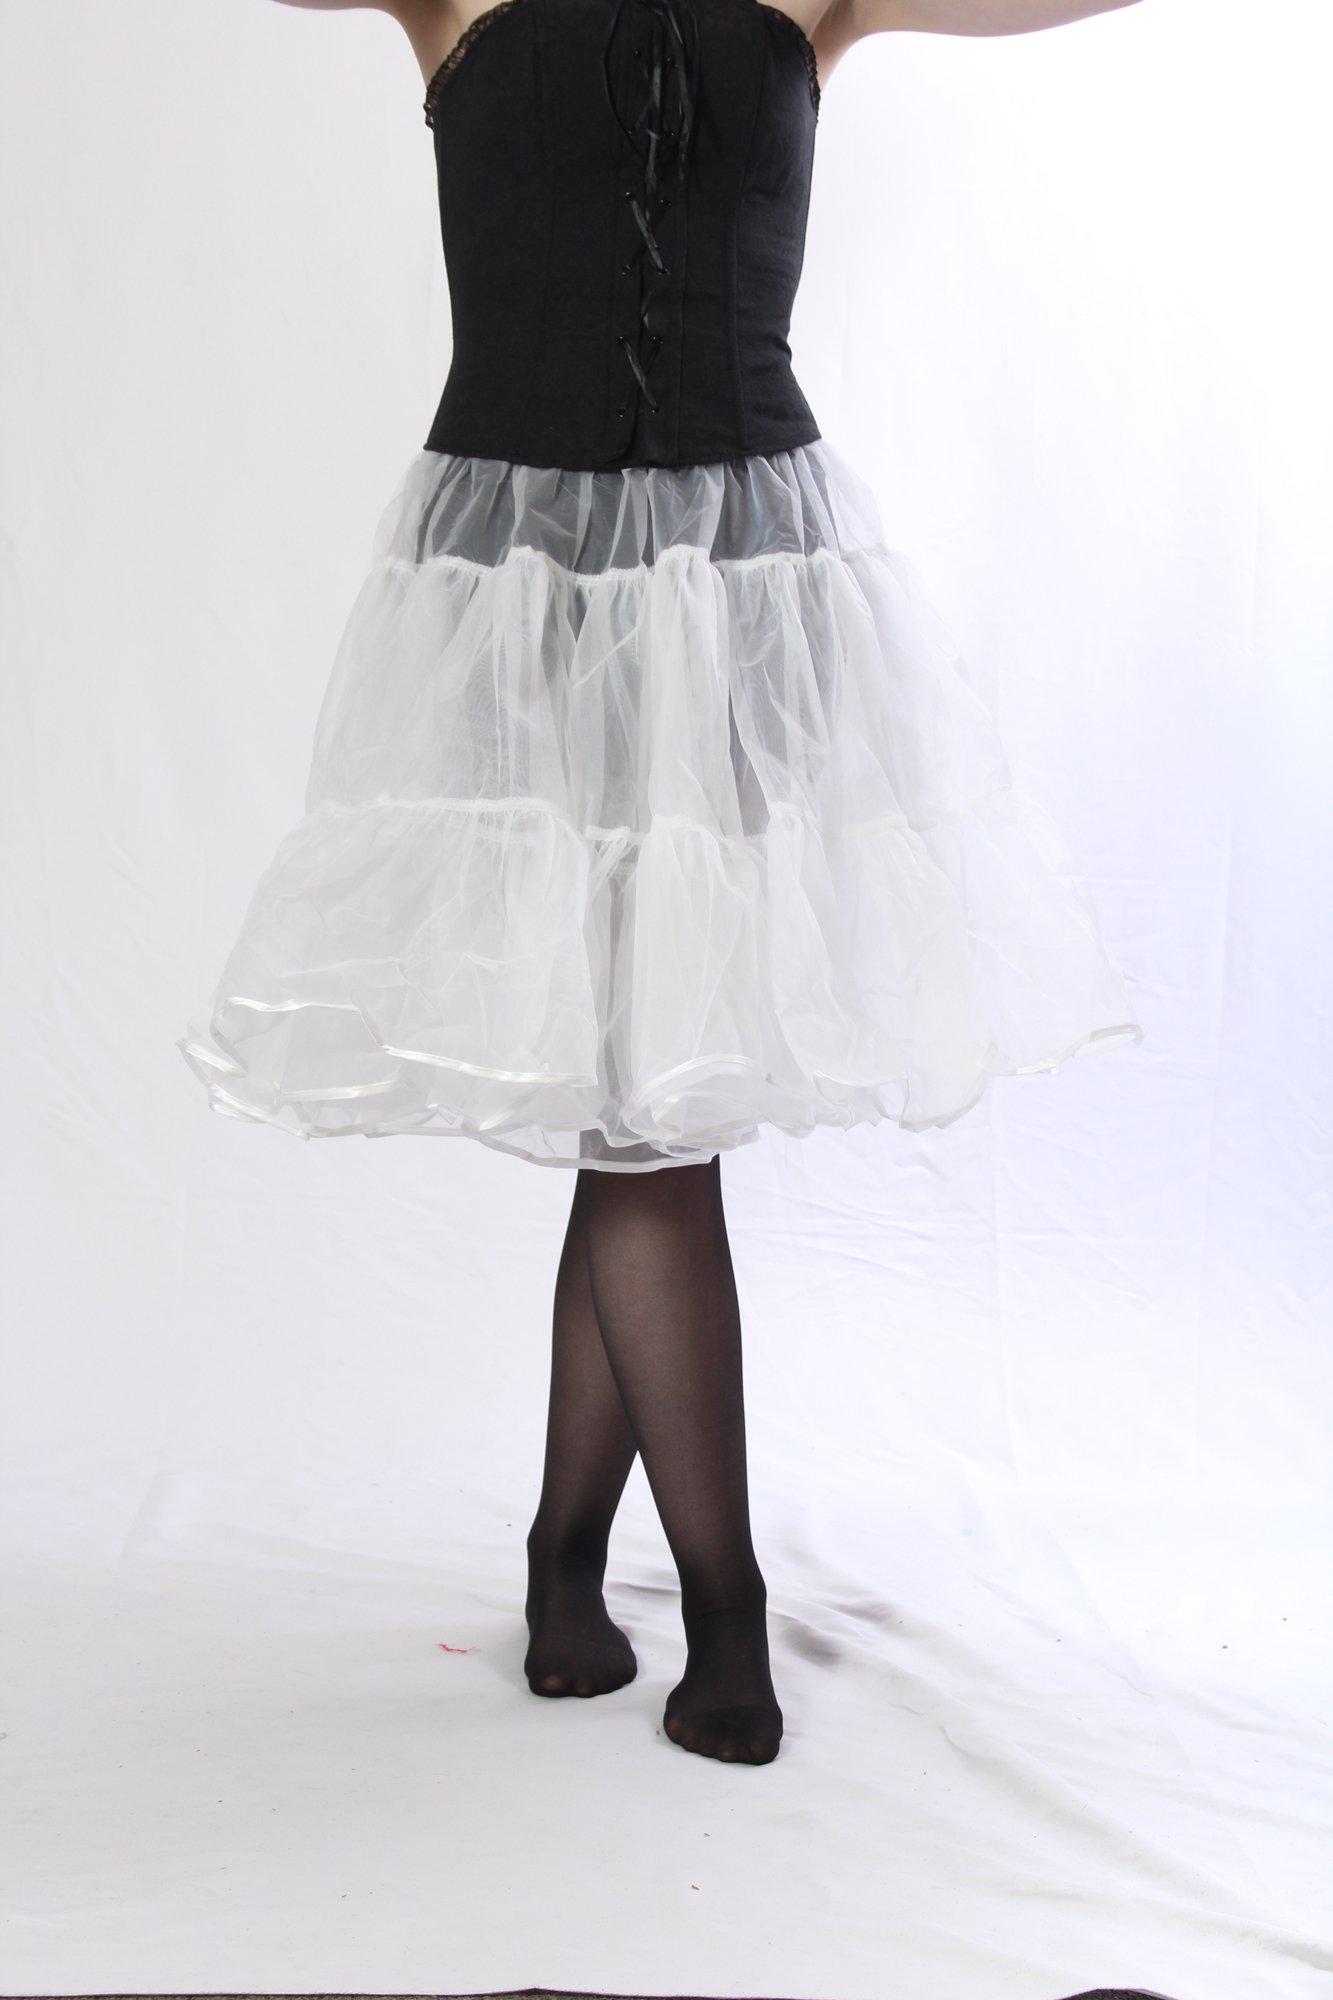 Petticoat Crinoline. Perfect Petticoat Skirt for Vintage Dresses, Petticoat Dresses, Poodle Skirts as Rockabilly Adult Tutu Skirt. Tulle Fabric; 22' Length - White Petticoat by BellaSous (Image #4)